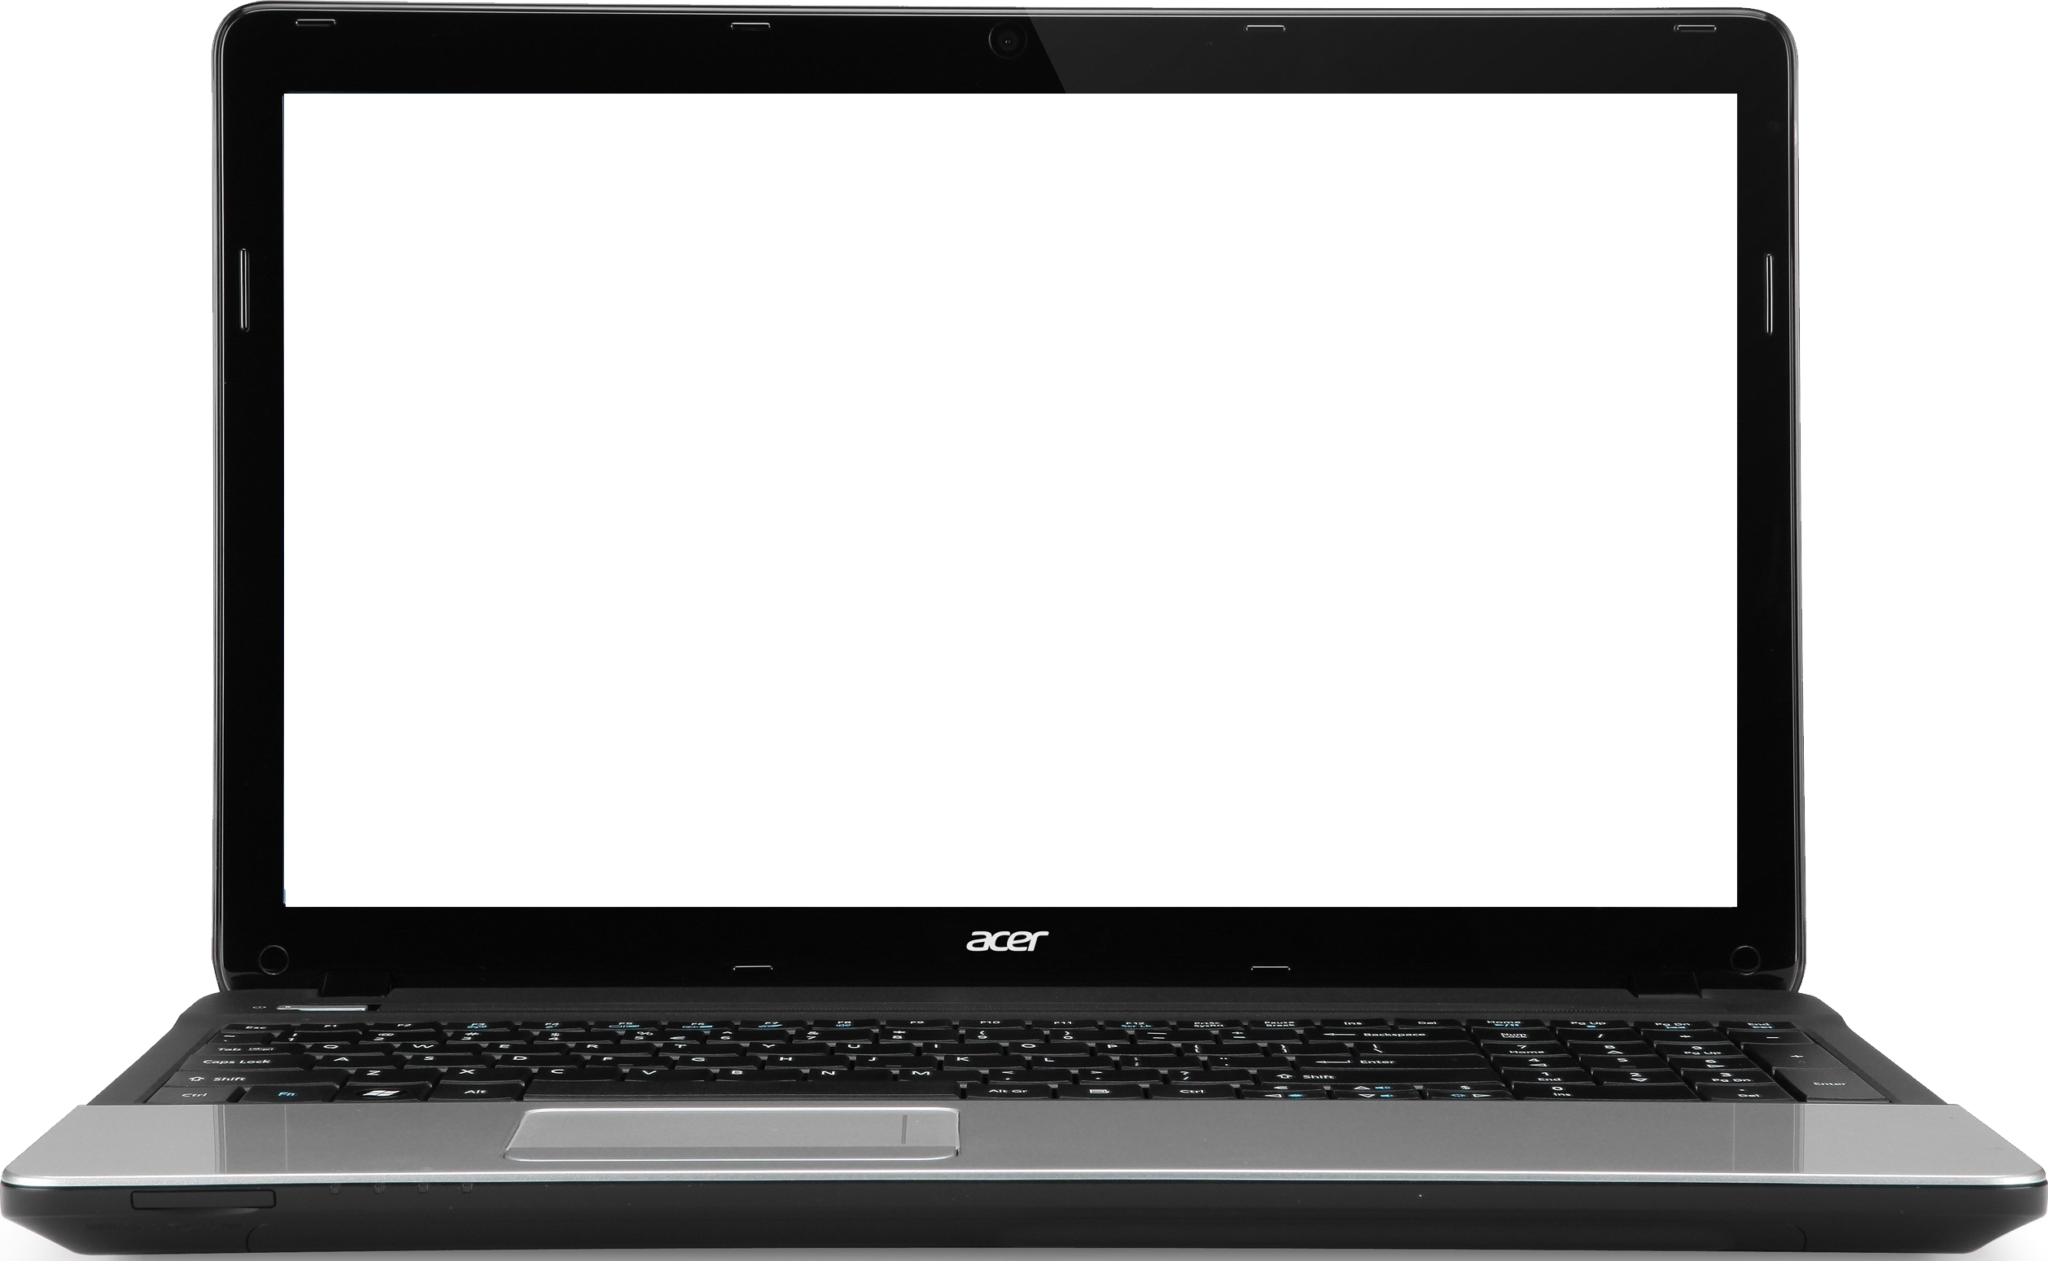 laptop jaka karta graficzna